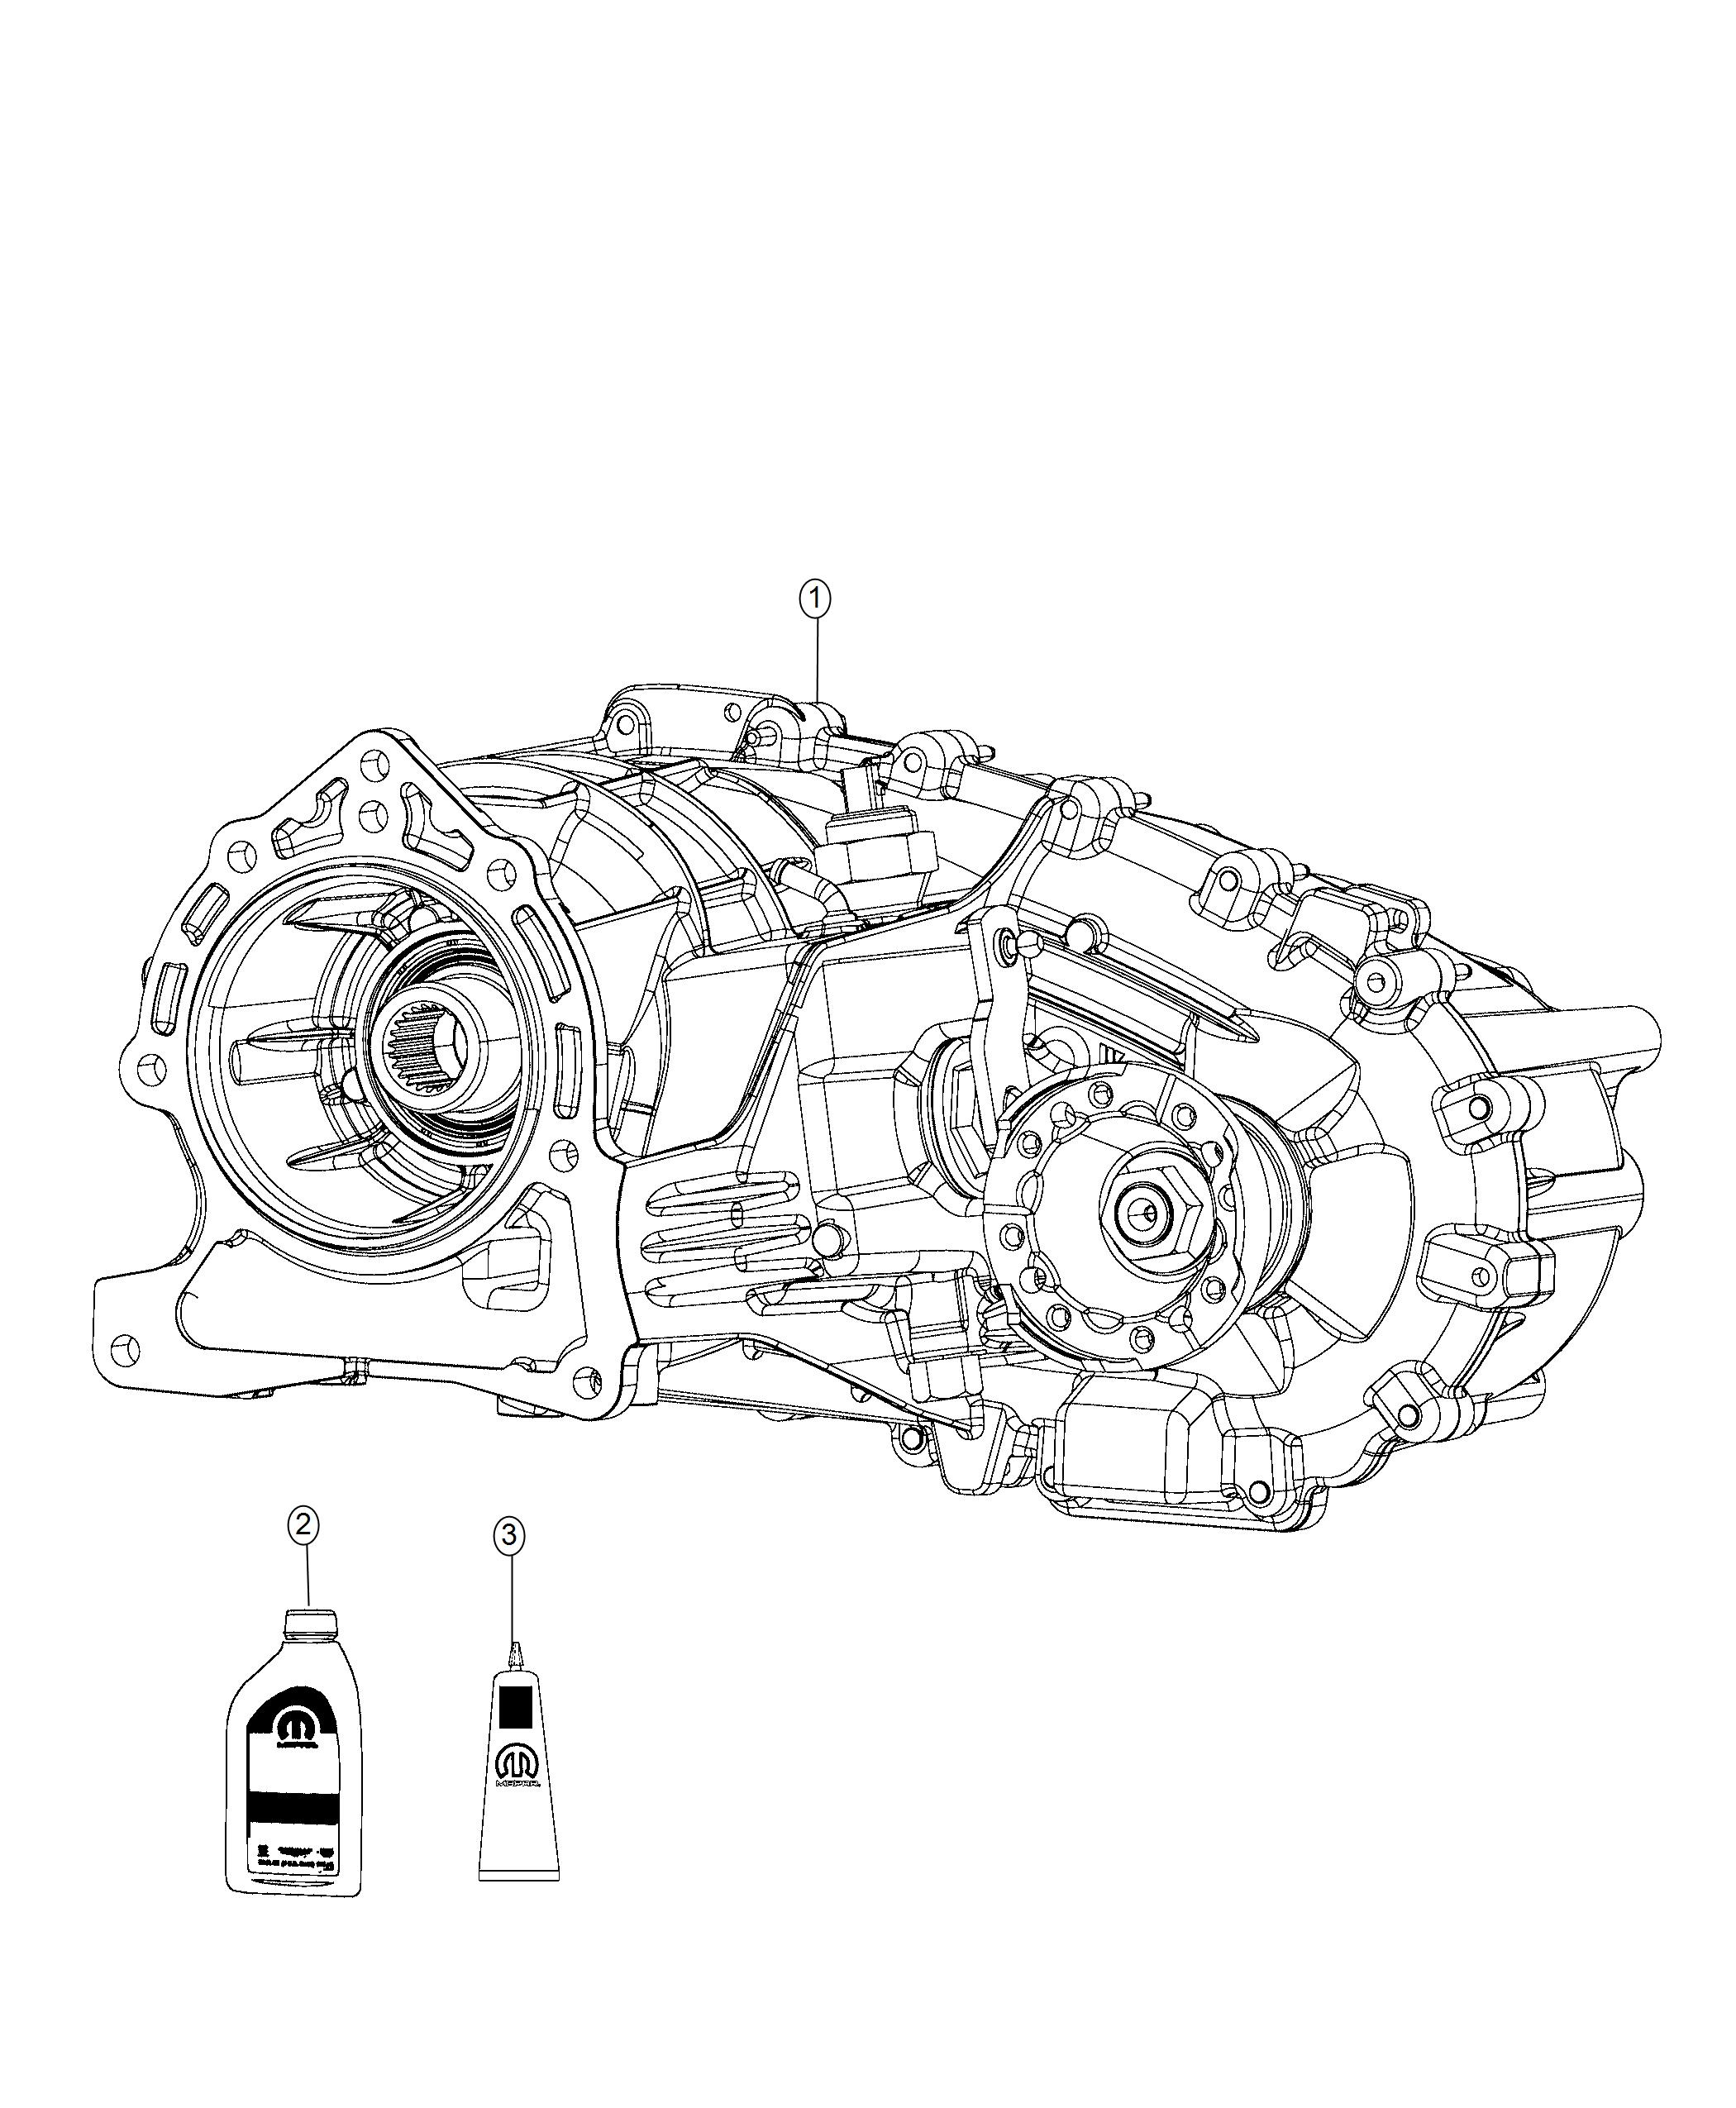 Jeep Wrangler Transfer case. Mp3022. Full, trac, time